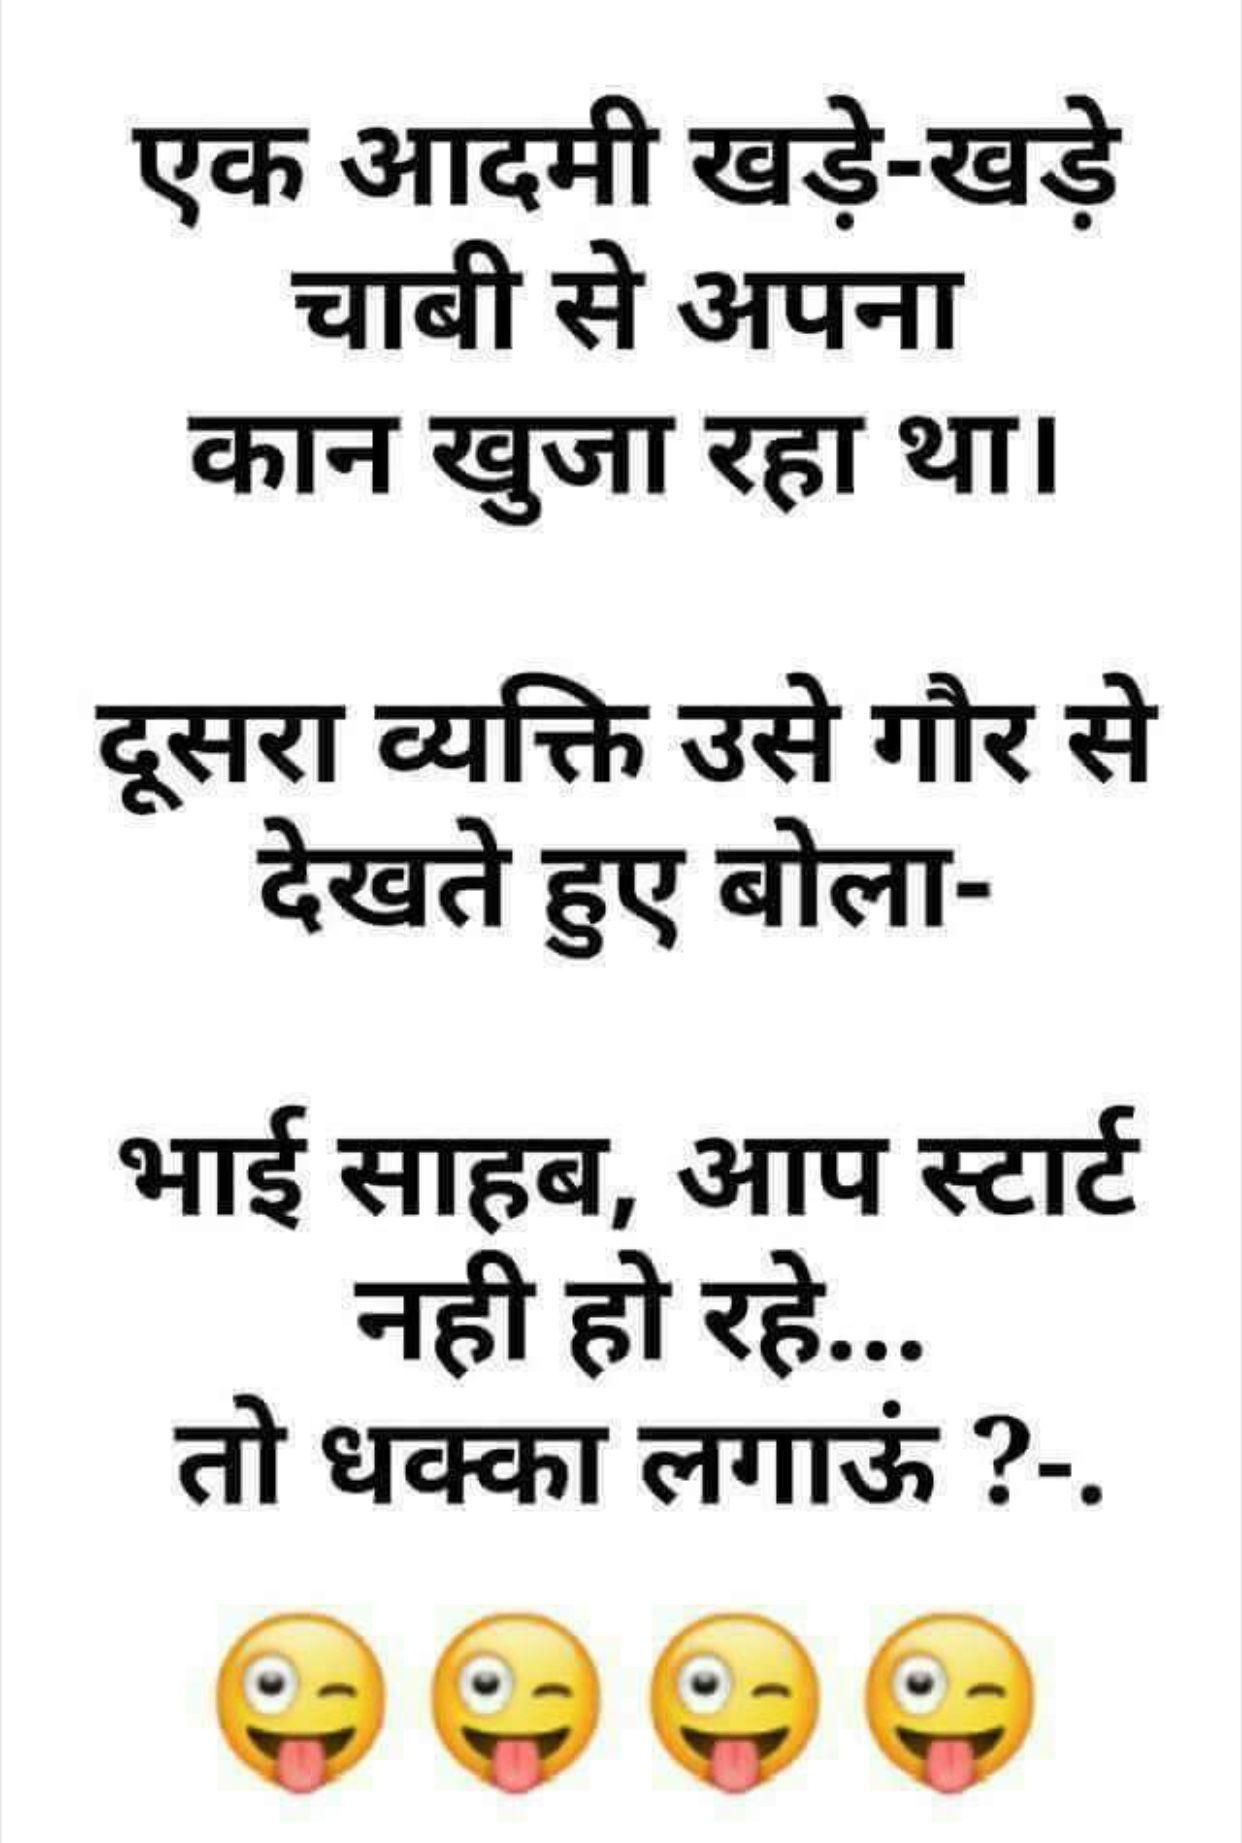 Funny Status Lines In Hindi : funny, status, lines, hindi, PrabhakarShuklaOfficial, #HindiQuotes, Quotes, Funny,, Funny, Jokes,, Jokes